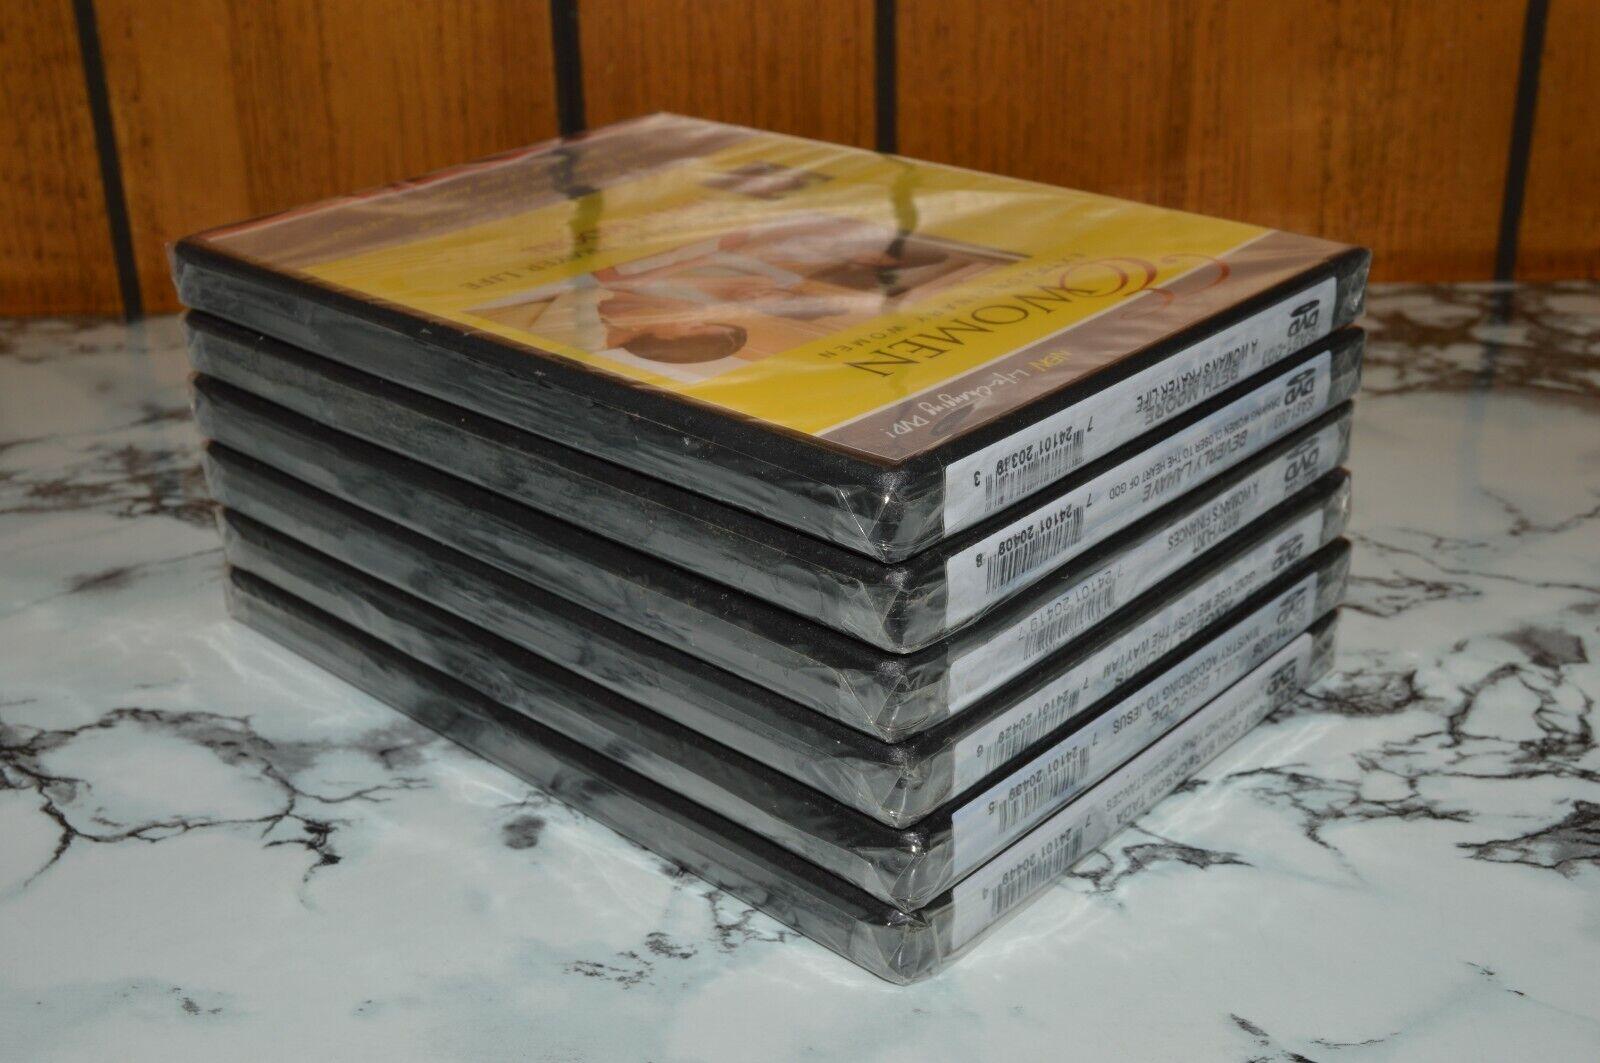 EXTRAORDINARY WOMEN NEW DVD LOT A Woman s Prayer Life Finances More READ  - $12.68